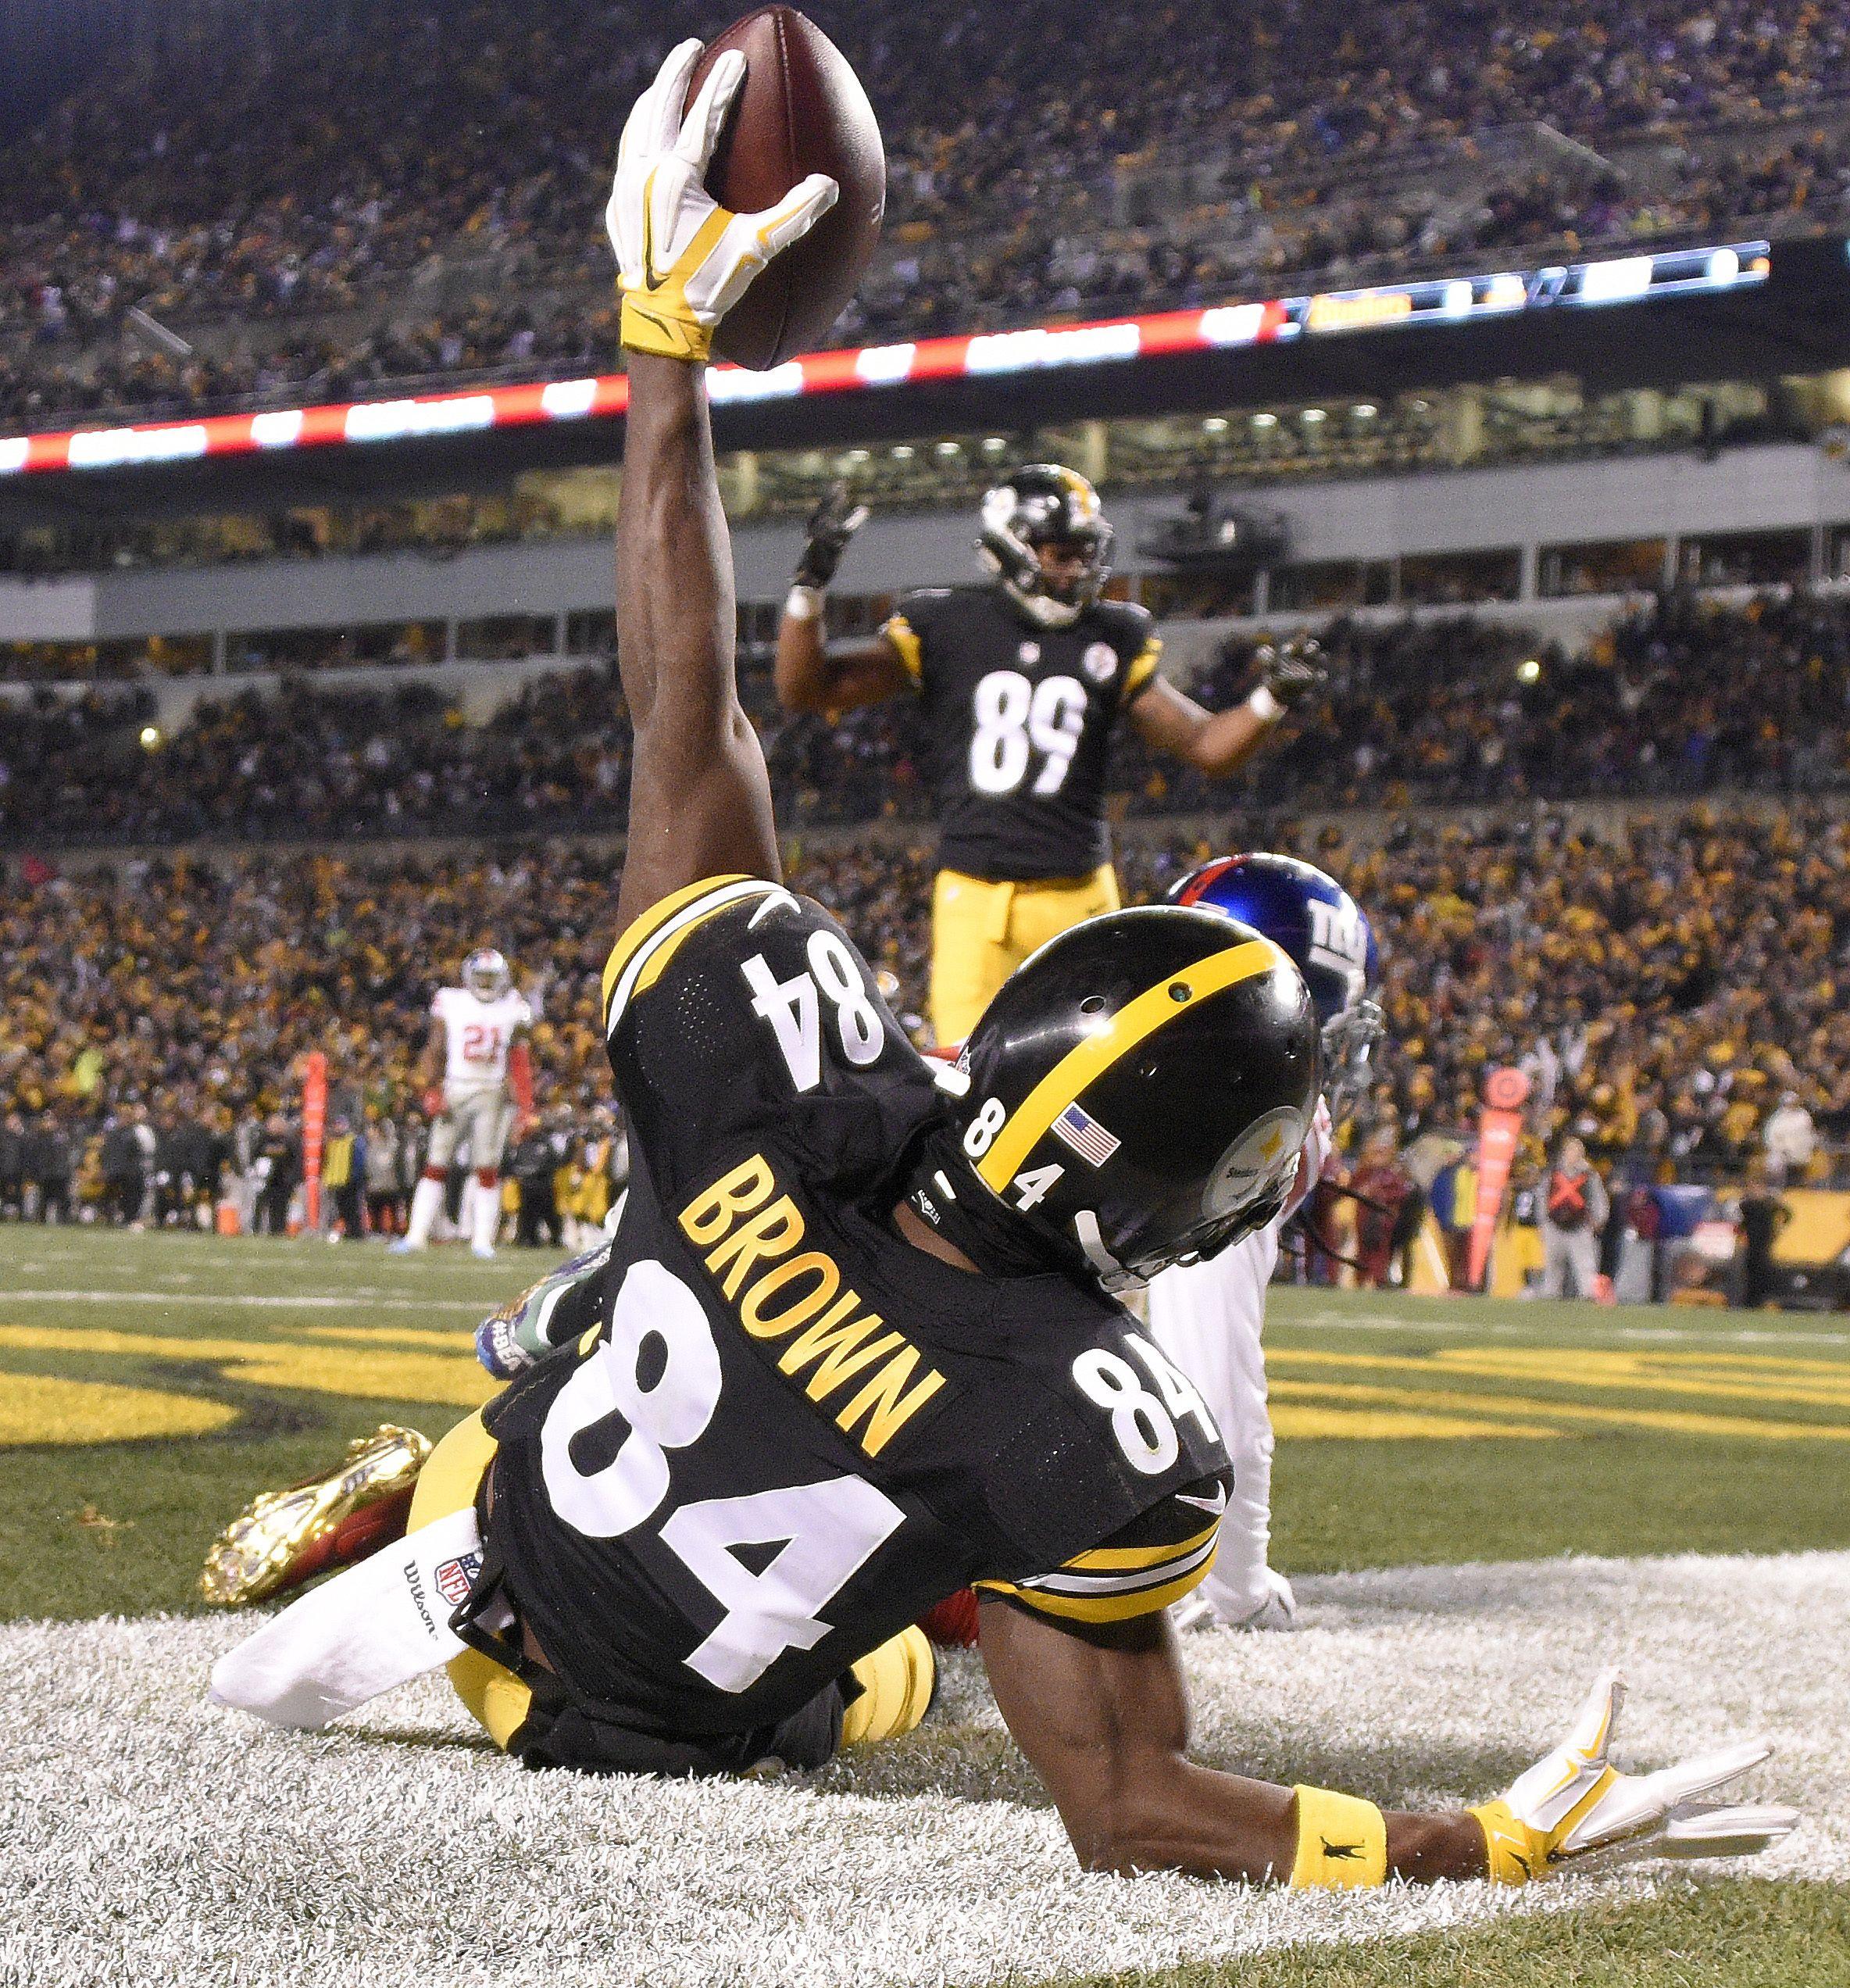 BOOM! Pittsburgh Steelers WR Antonio Brown always gets the